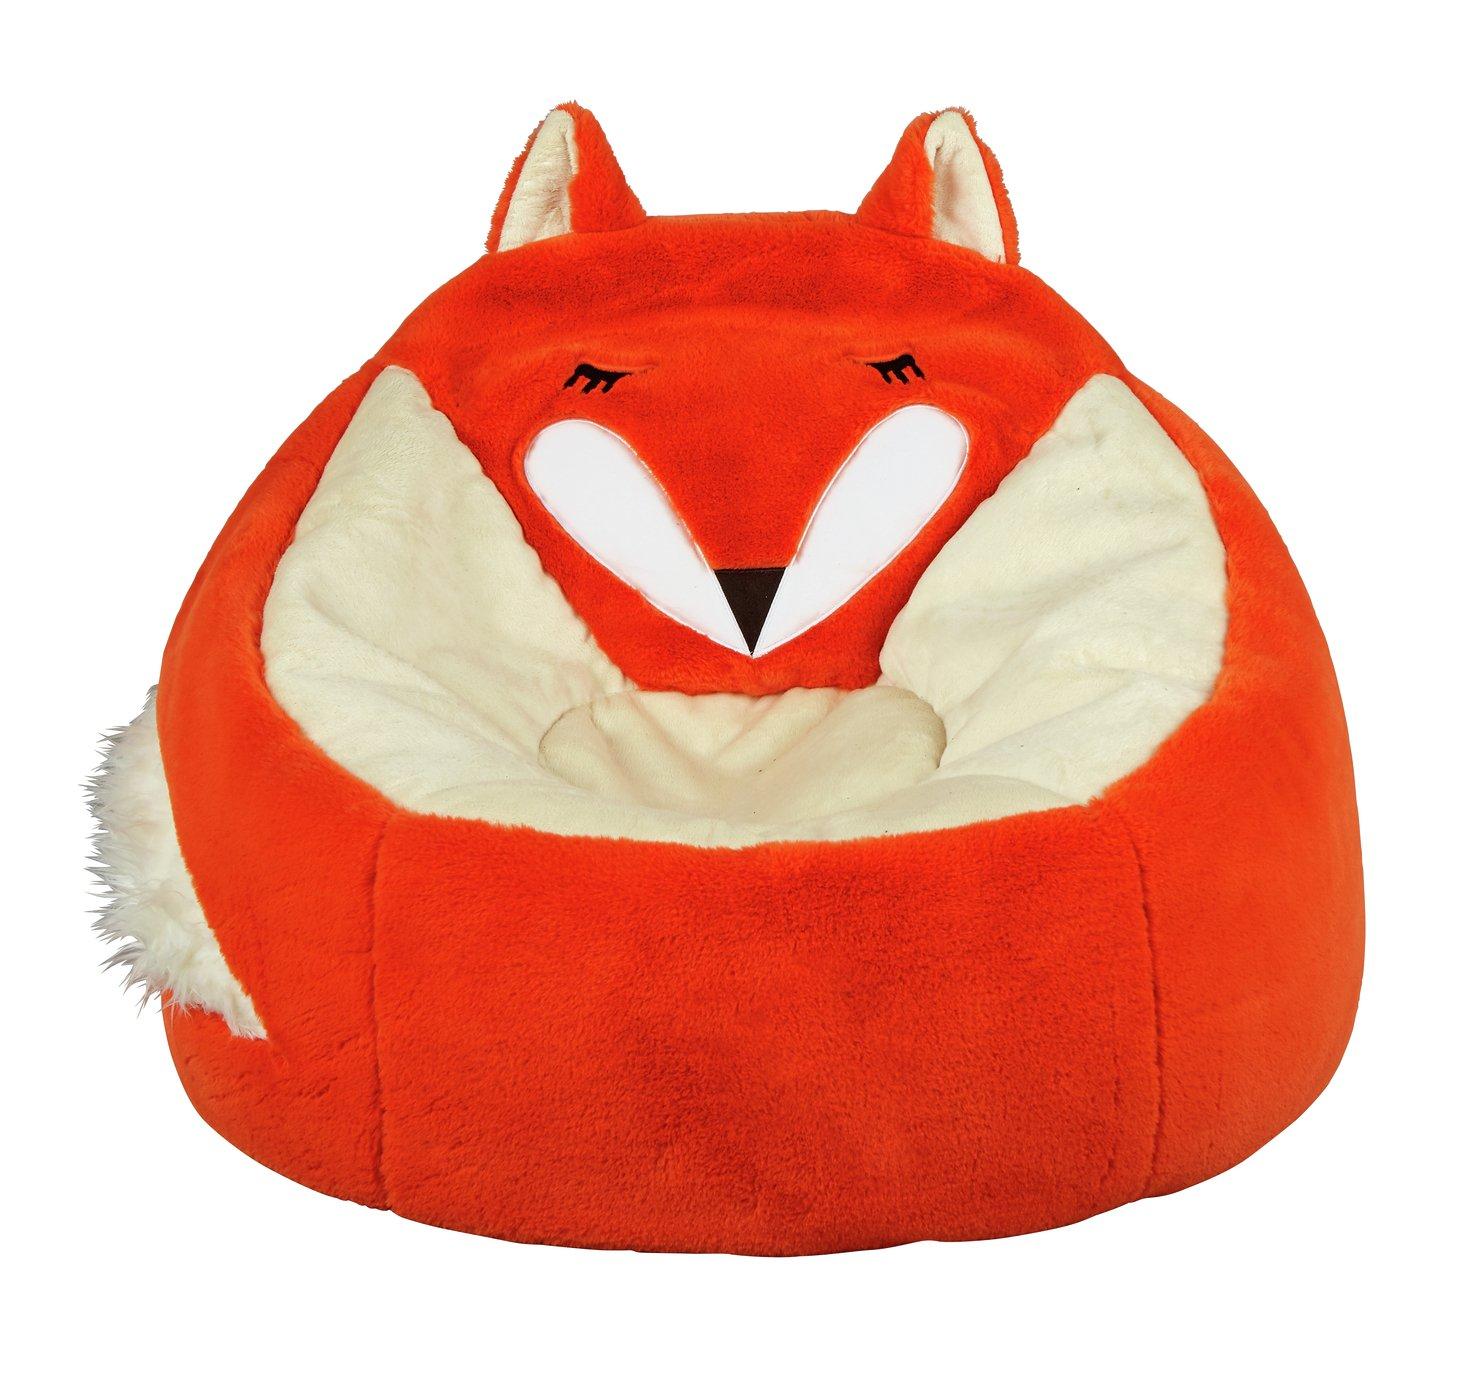 Magnificent Argos Home Fox Bean Bag Chair 8477659 Argos Price Creativecarmelina Interior Chair Design Creativecarmelinacom